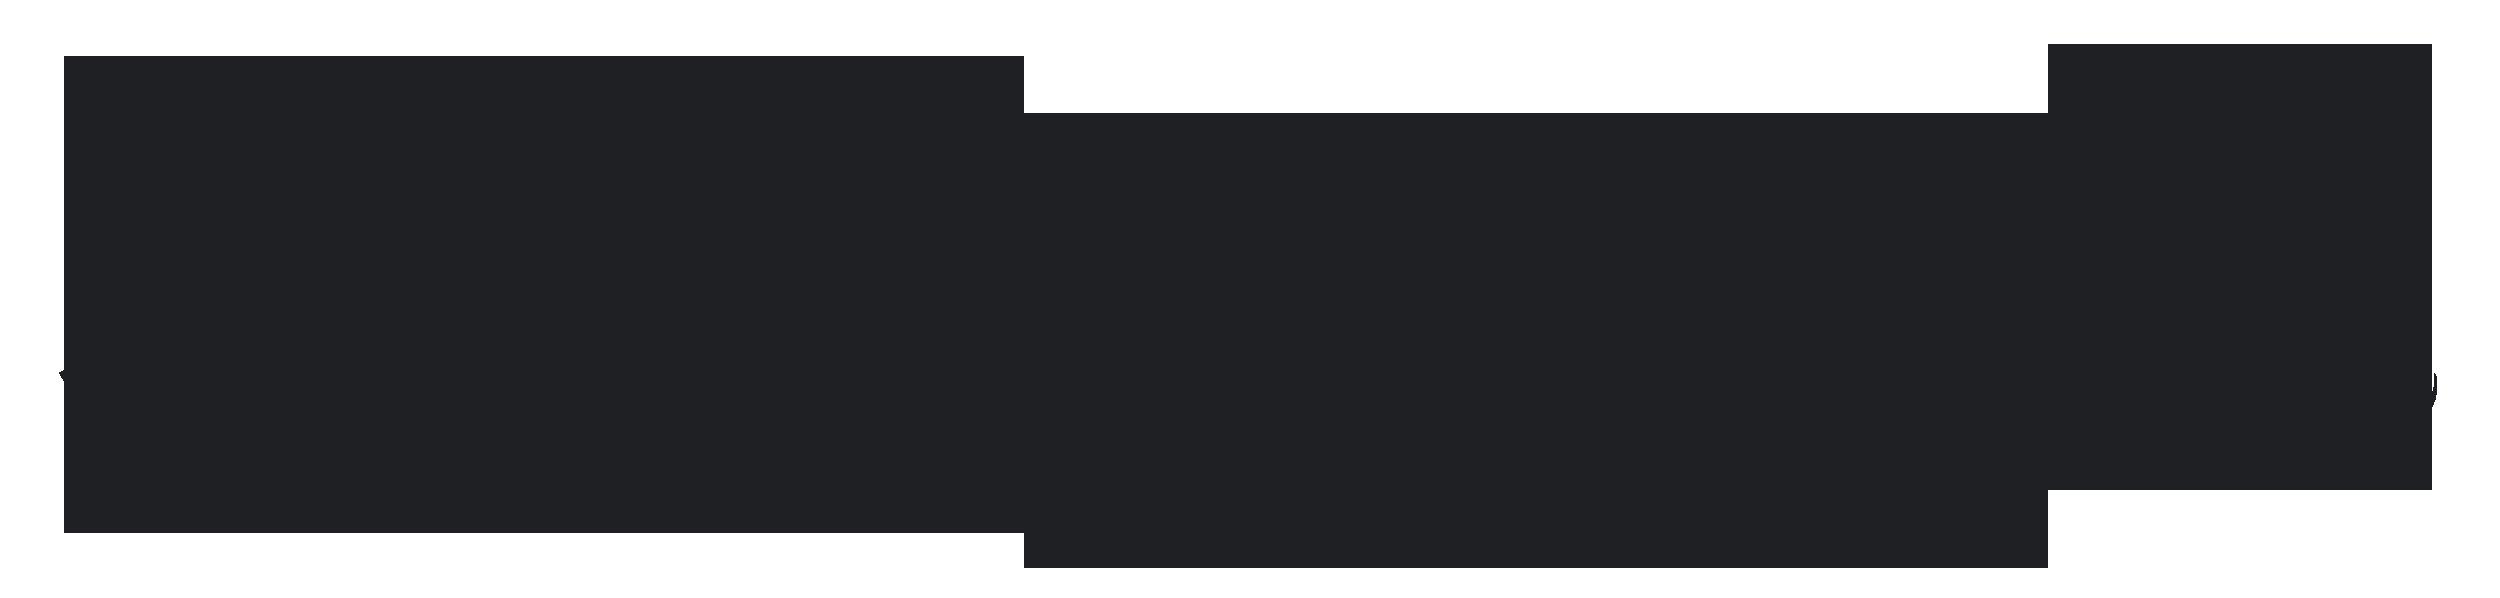 Extreminal Webzine